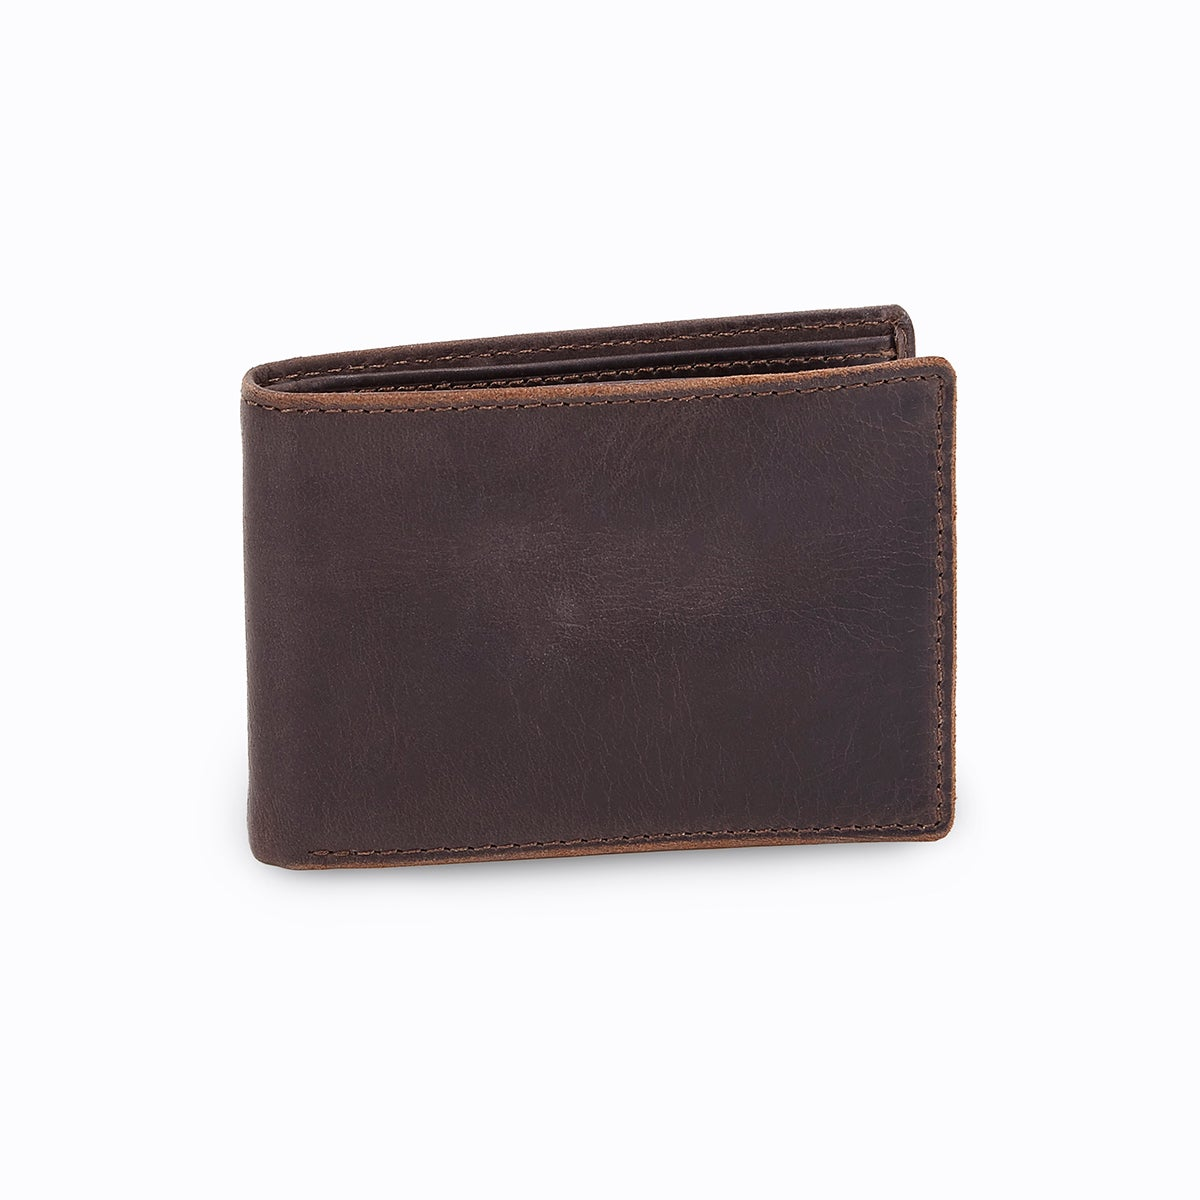 Mns Anderson FPW Bifold blk lthr wallet